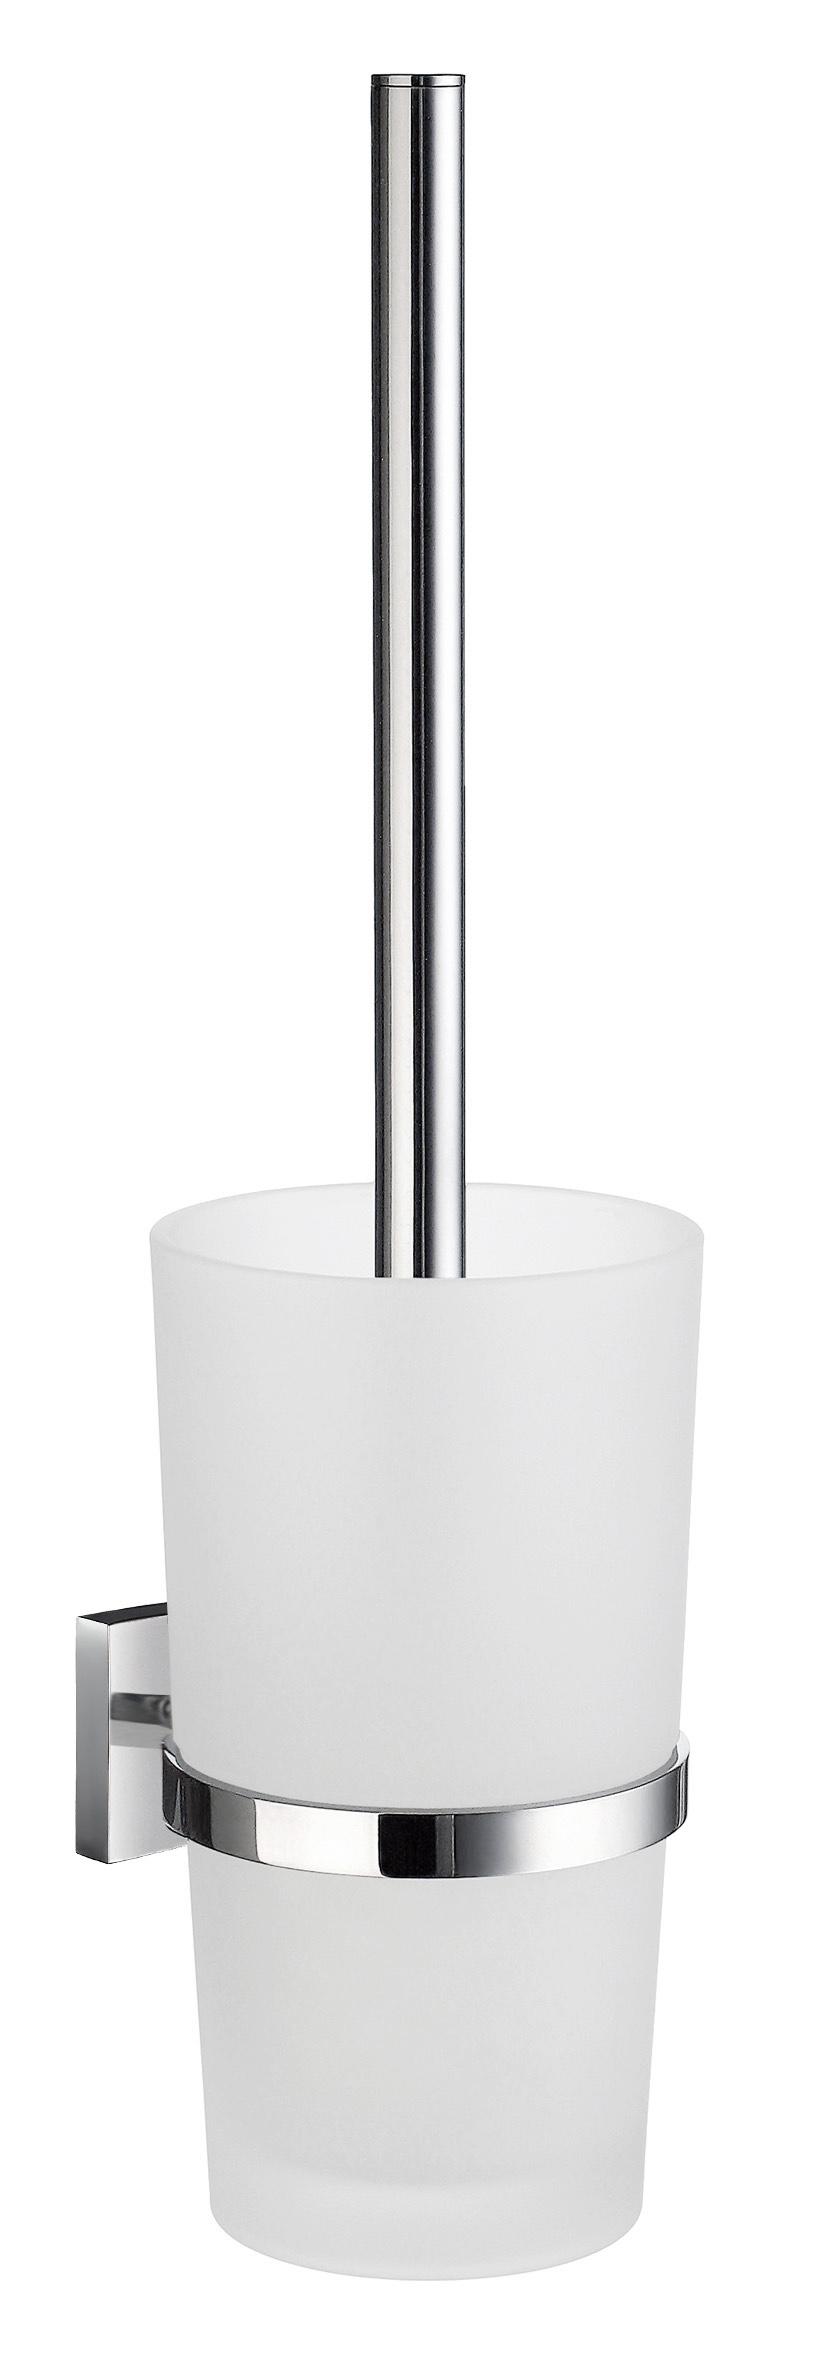 SMEDBO HOUSE WC-Bürste mit Behälter Verchromt/Mattglas